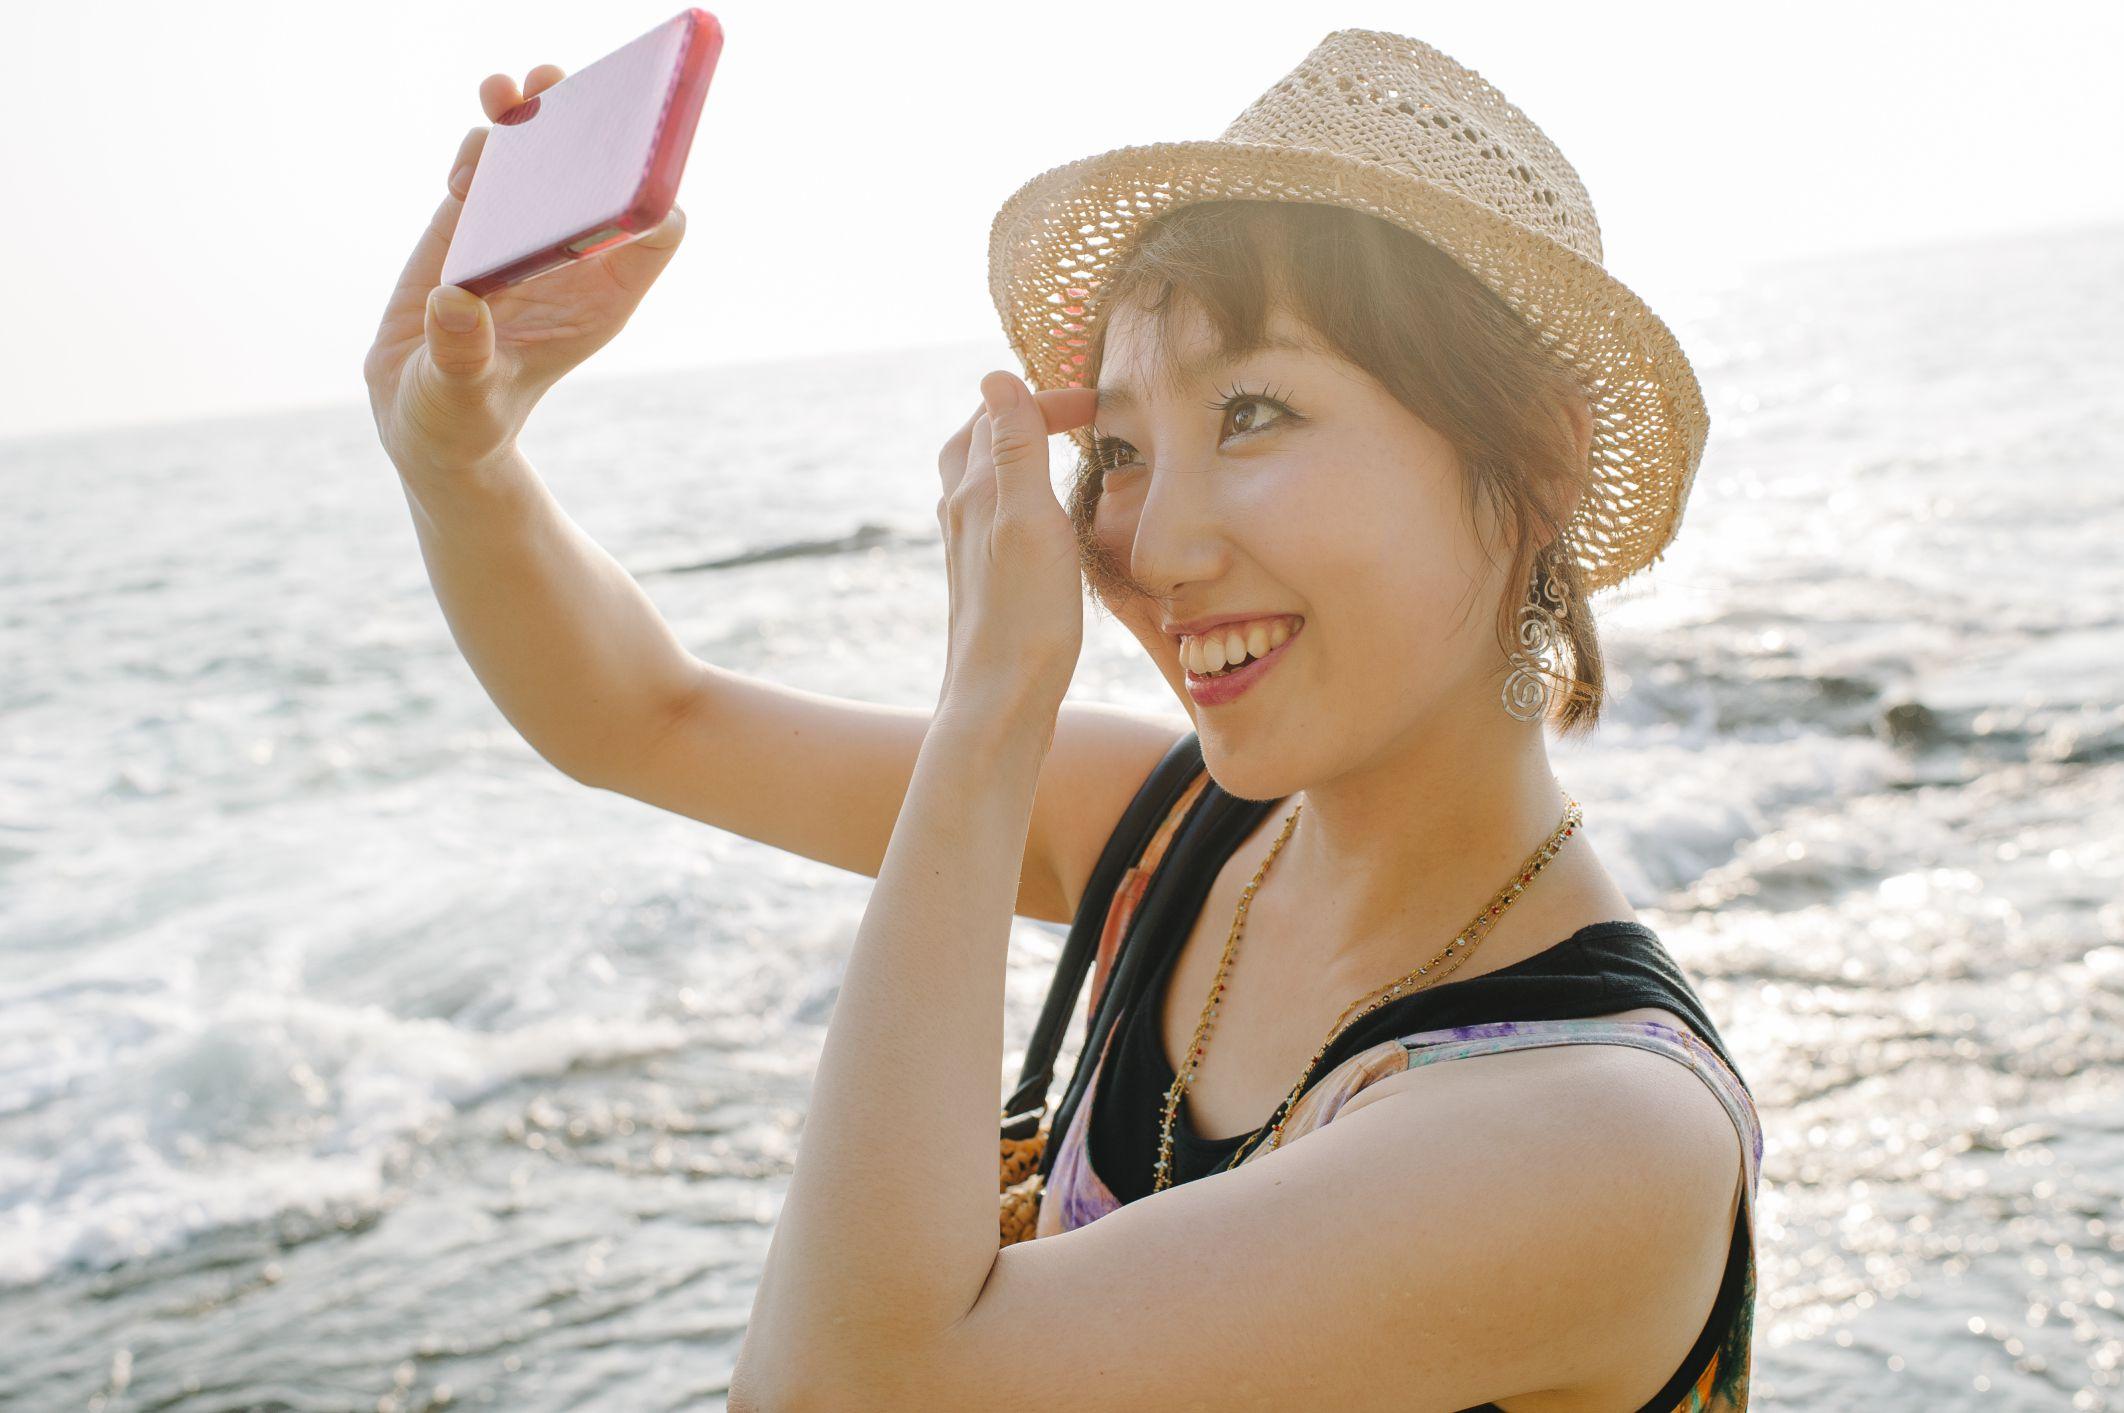 8 Etiquette Tips For Taking Selfies